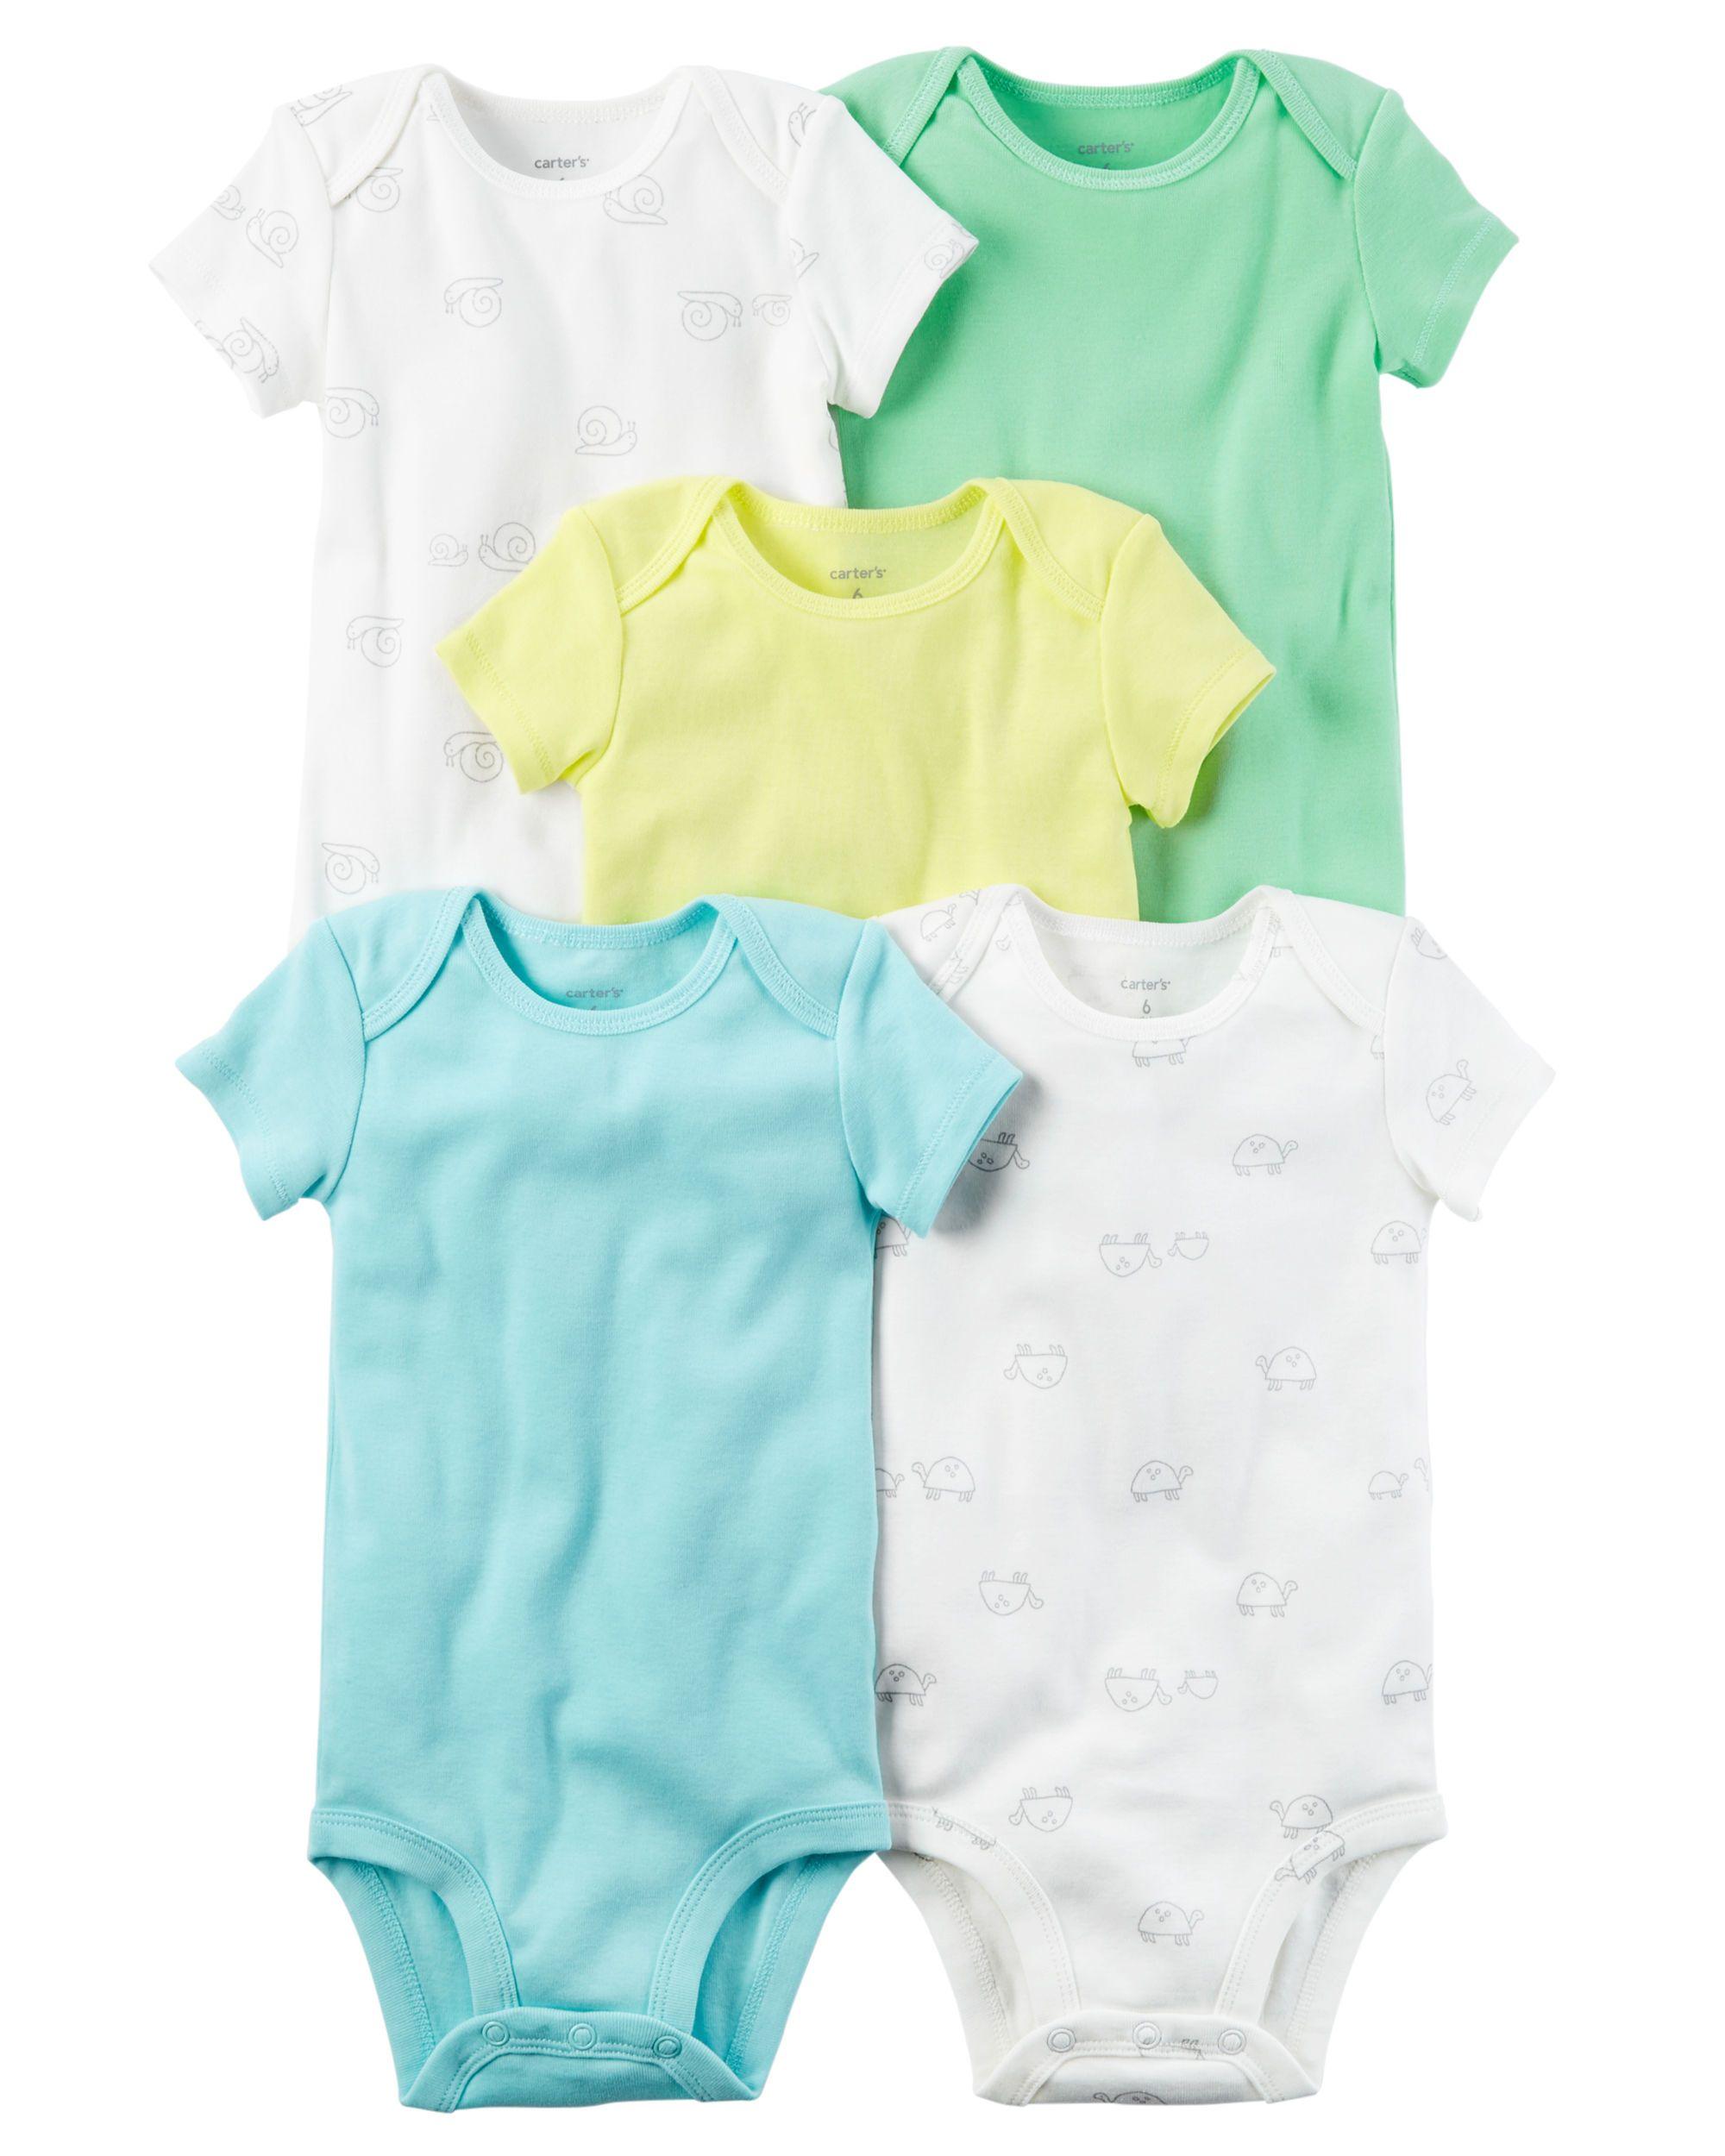 5 Pack Short Sleeve Original Bodysuits